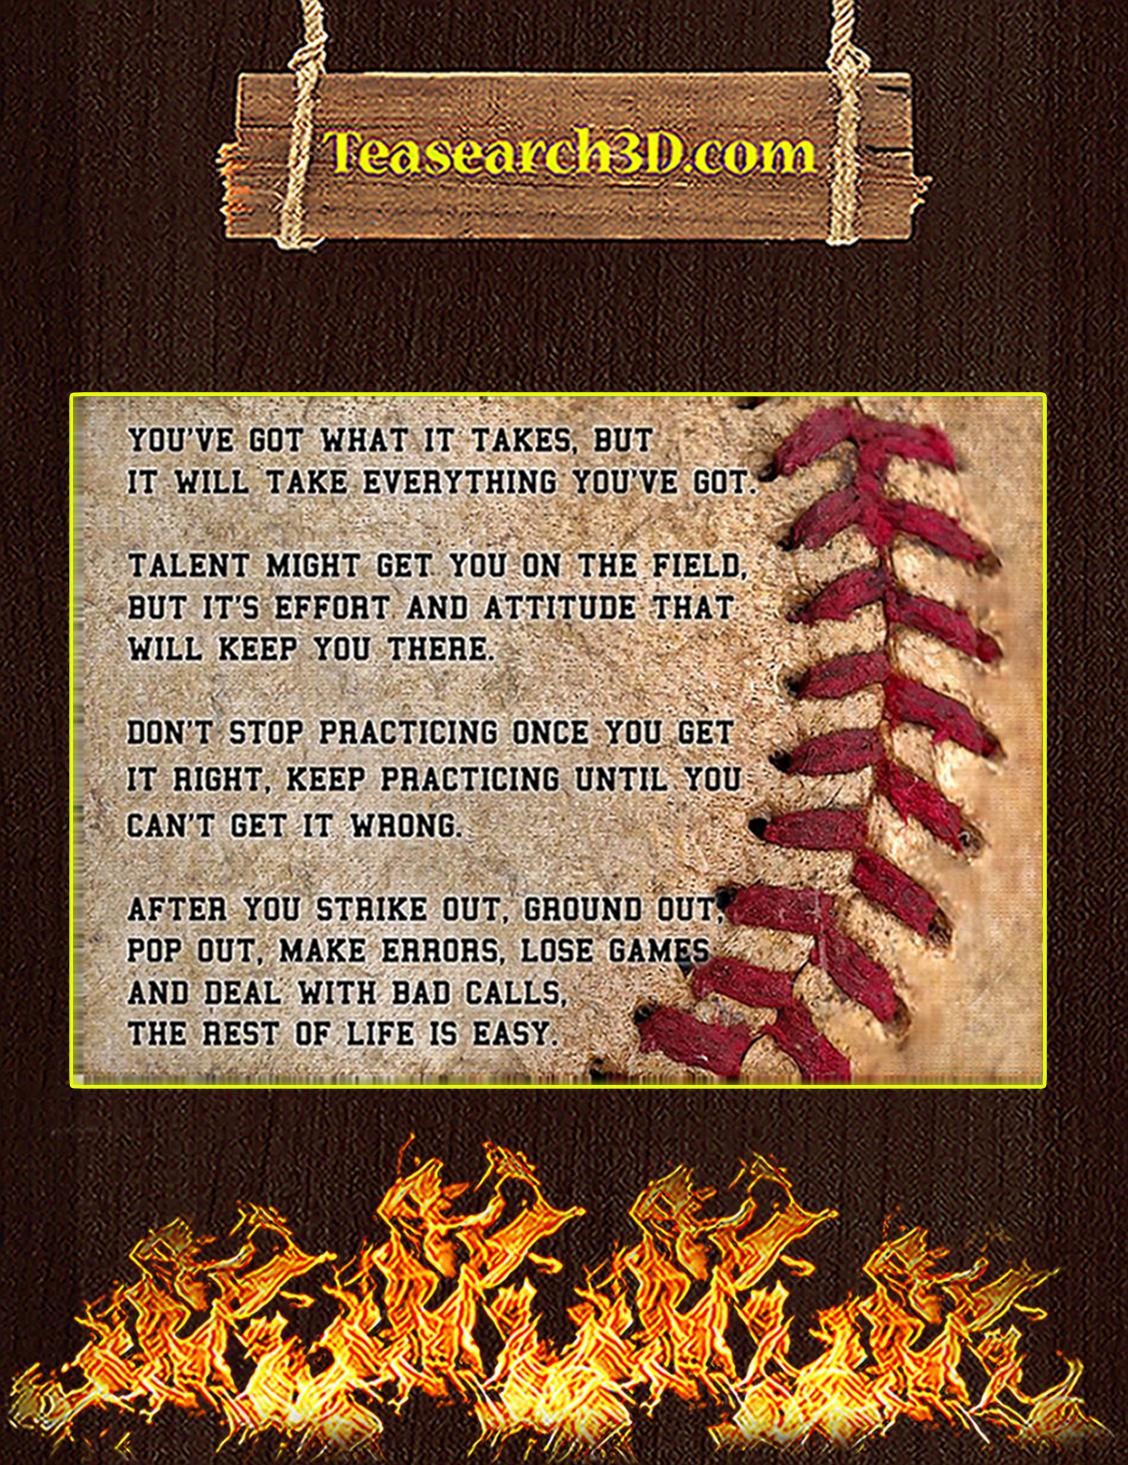 Baseball motivation you got what it takes poster A3